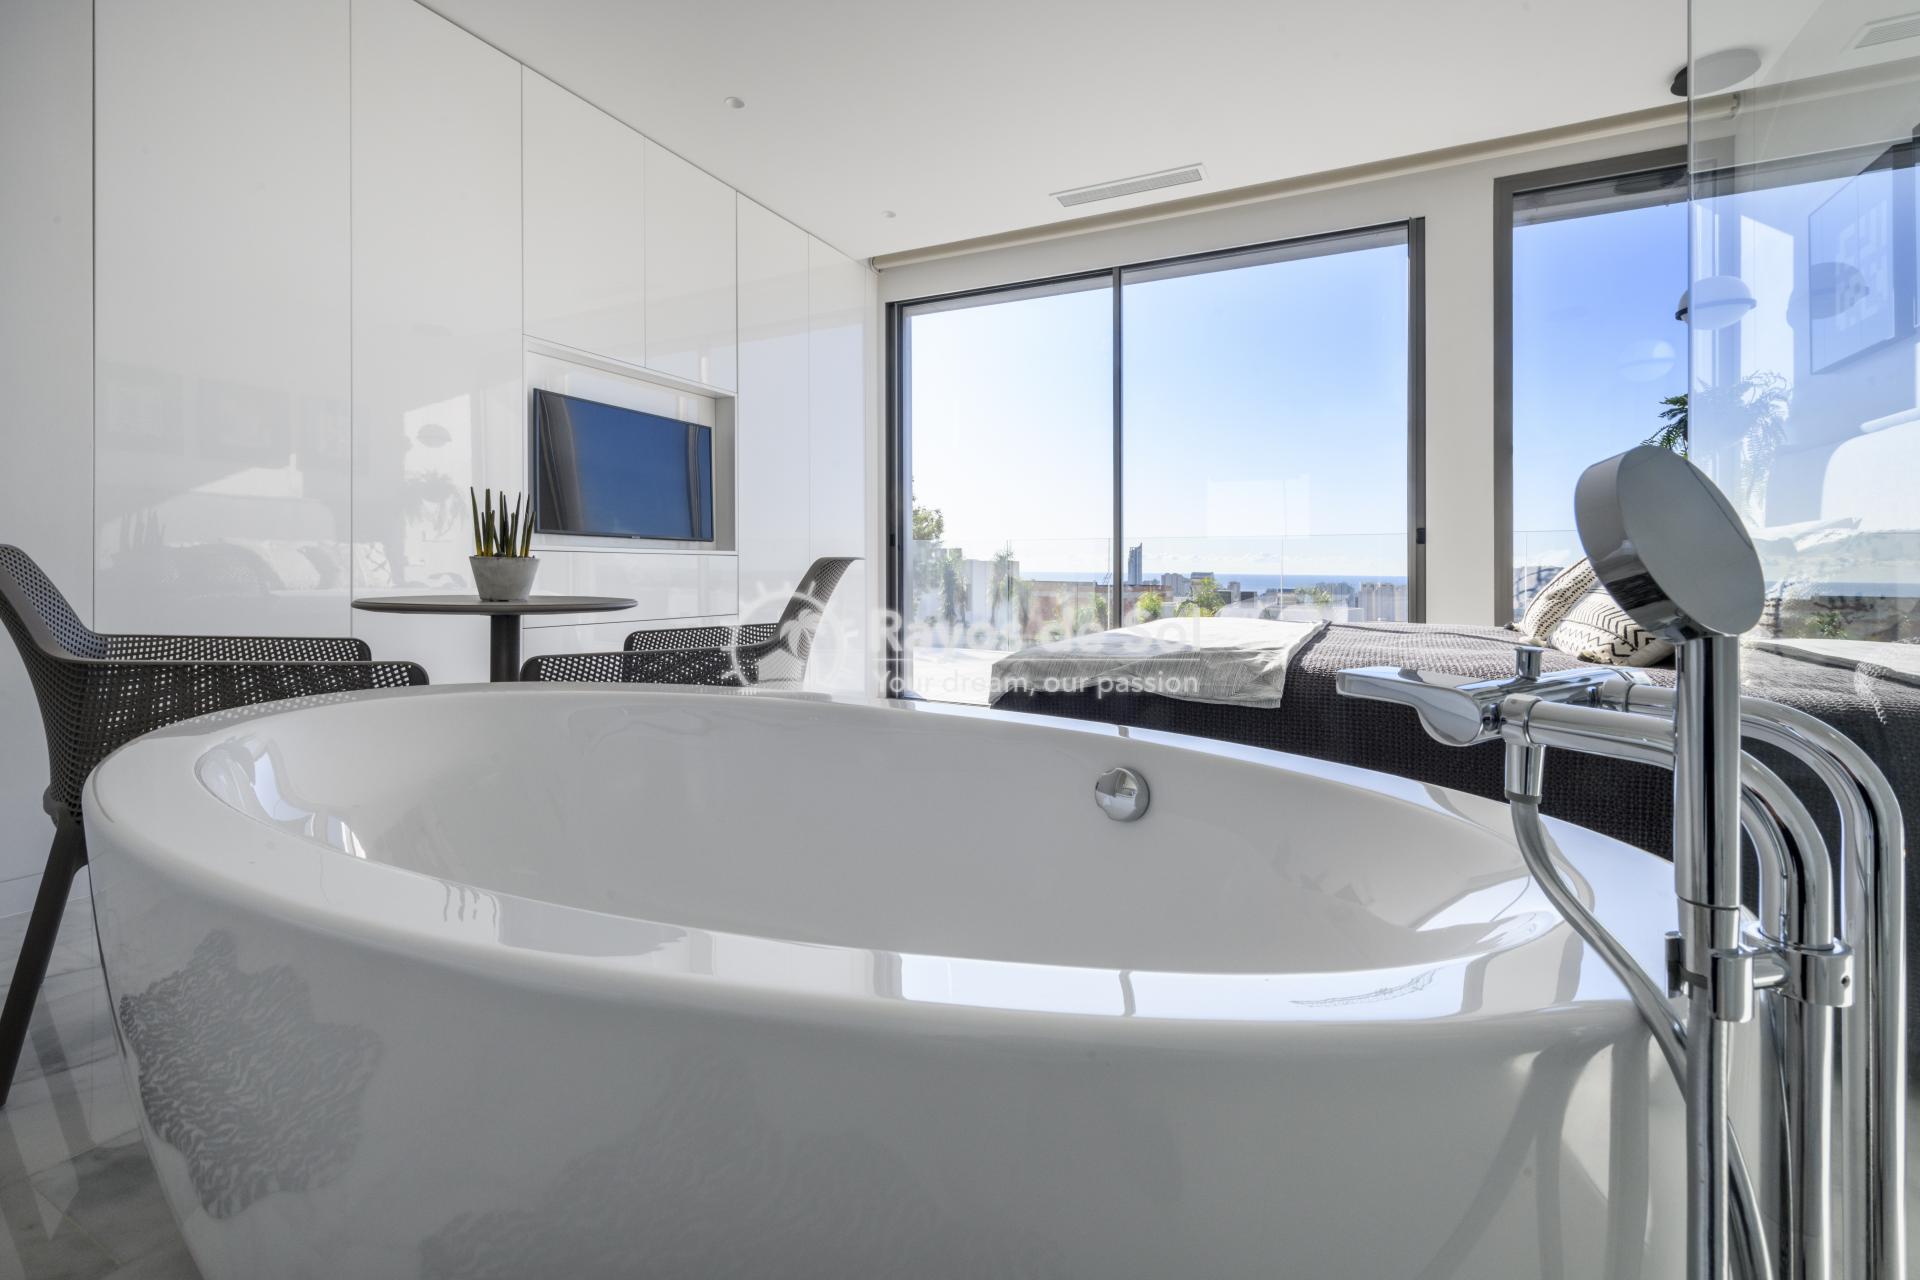 Stunning modern design villa  in Sierra Cortina, Finestrat, Costa Blanca (Praga 19) - 32